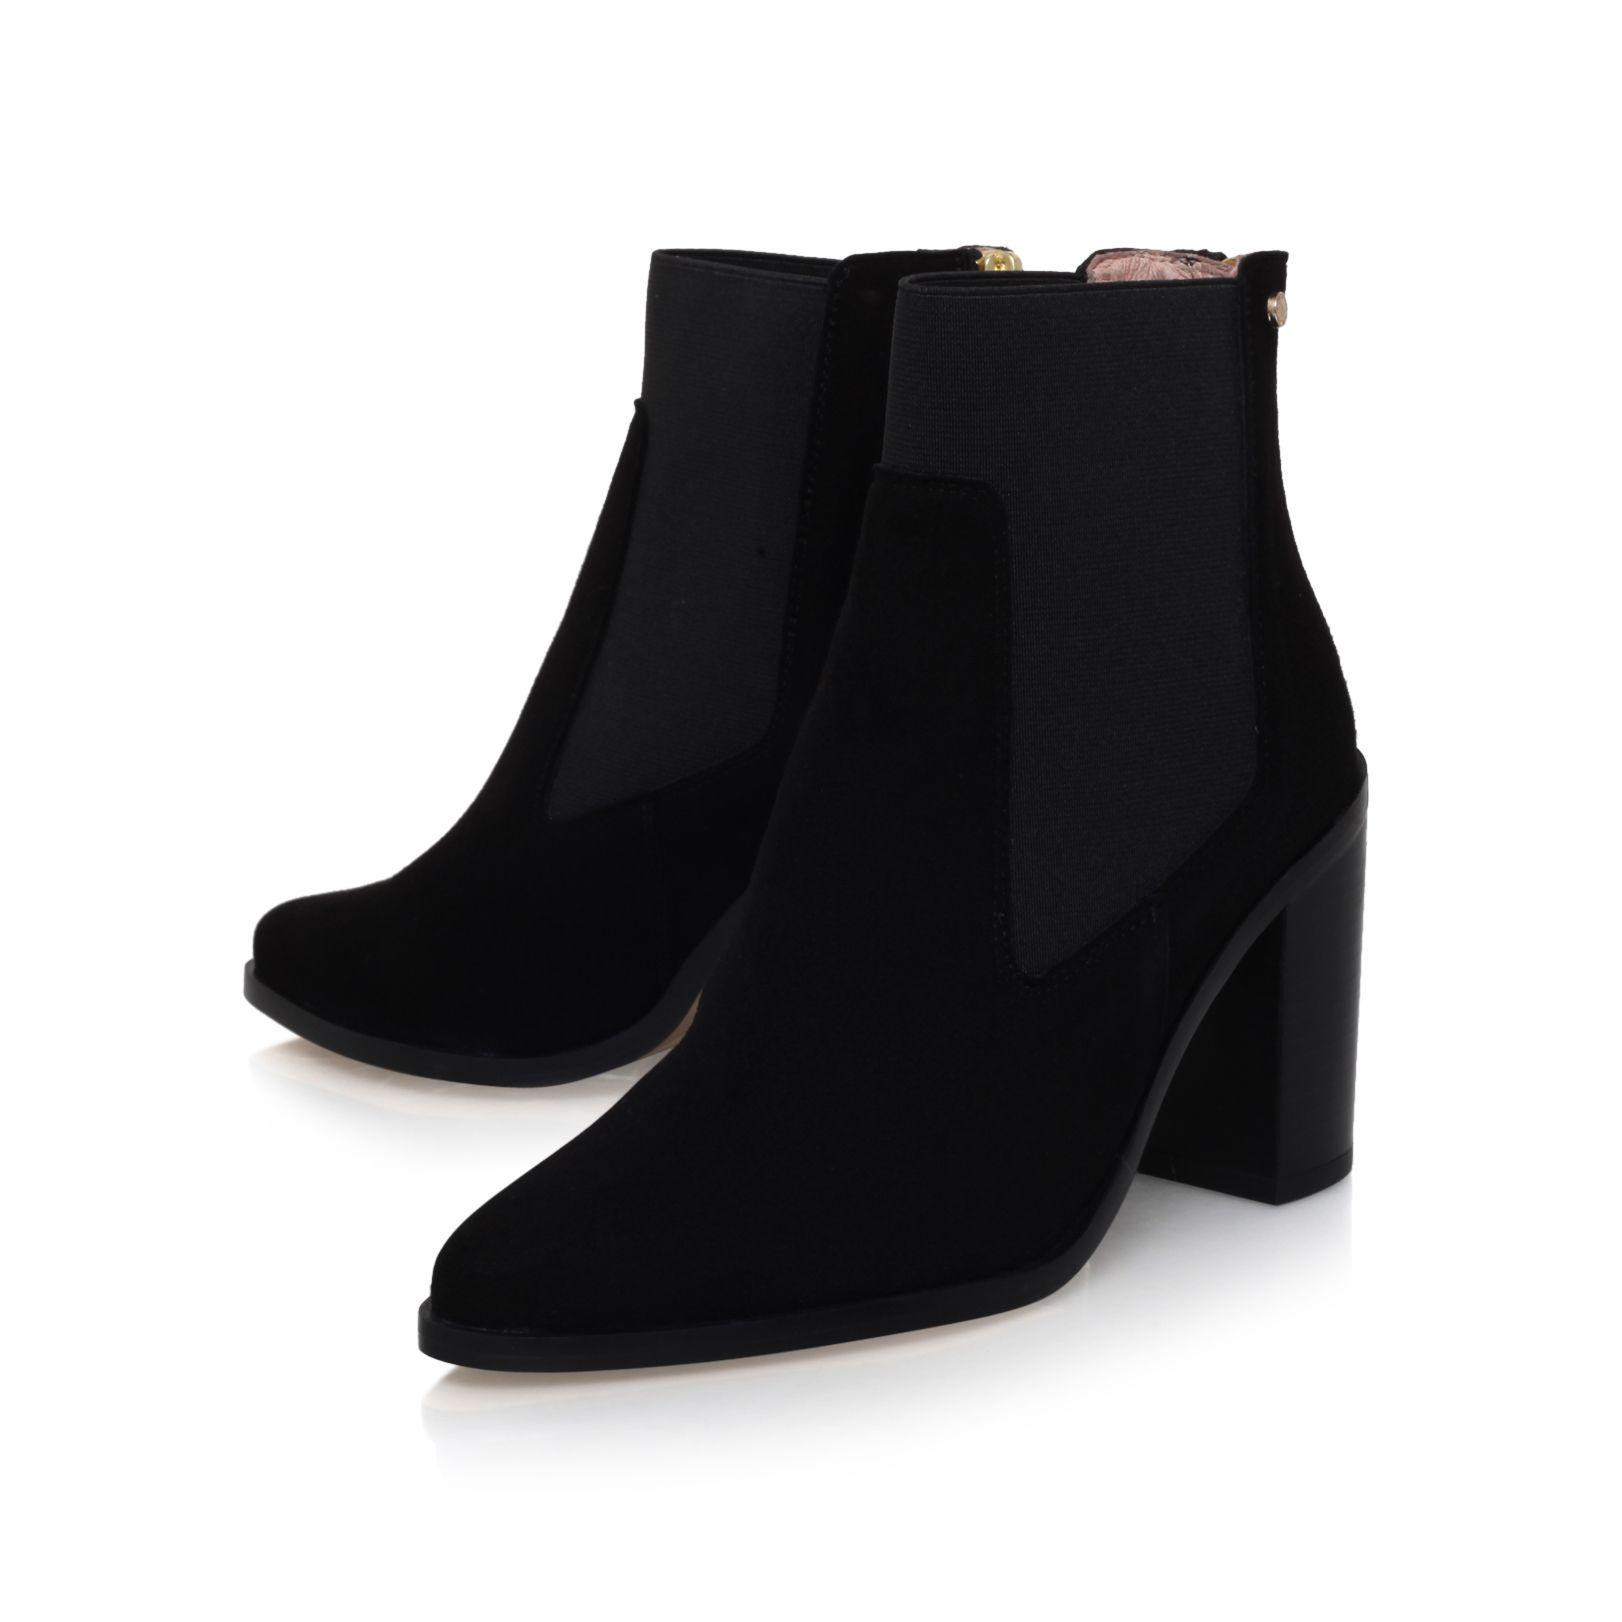 Kurt Geiger Dellow Mid Heel Ankle Boots in Black